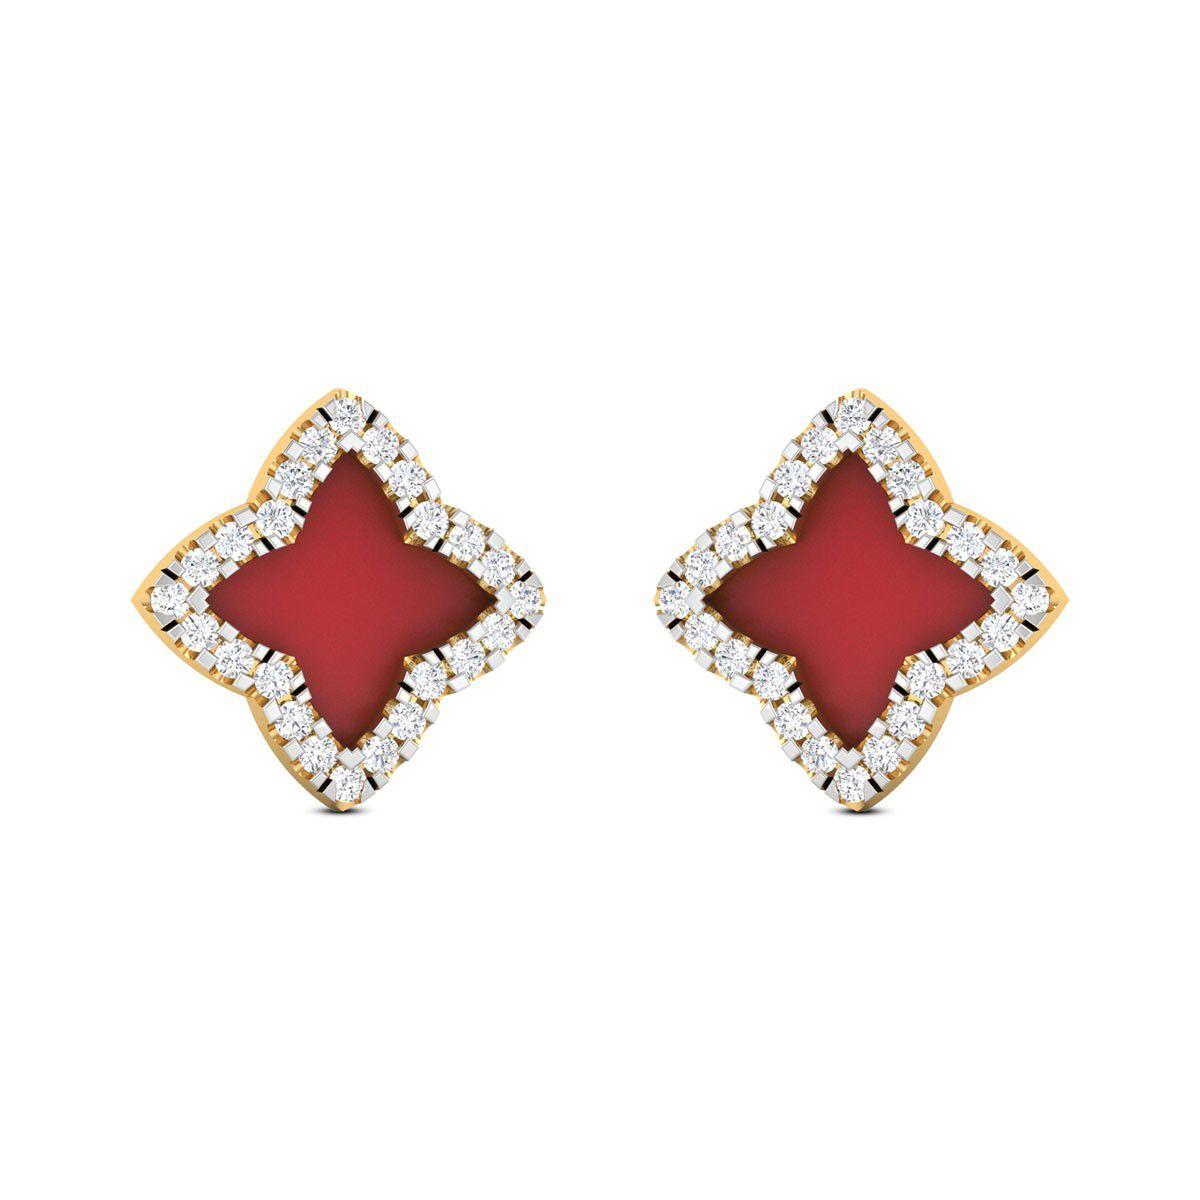 Zaamor Diamonds 18k BIS Hallmarked Yellow Gold Diamond Studs